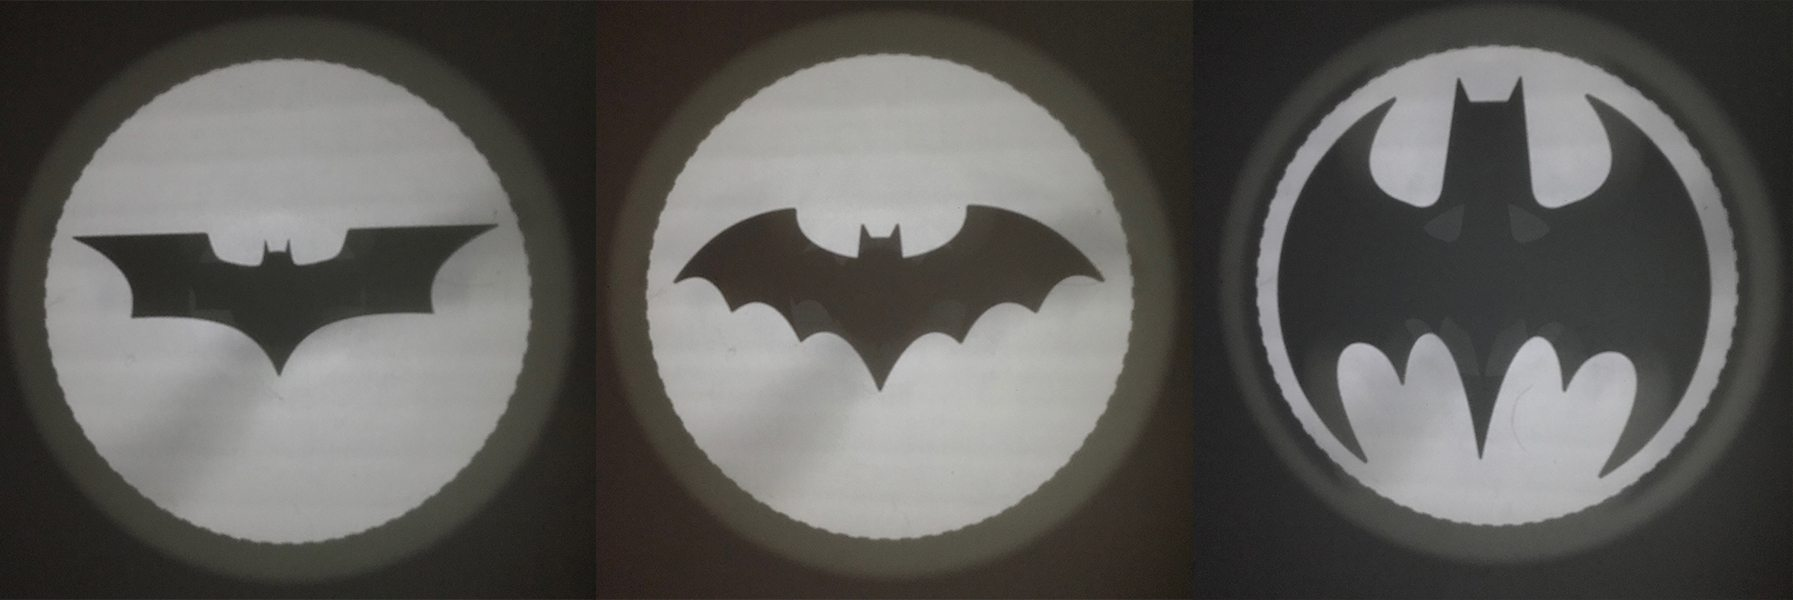 Bat Symbols Image: Dakster Sullivan